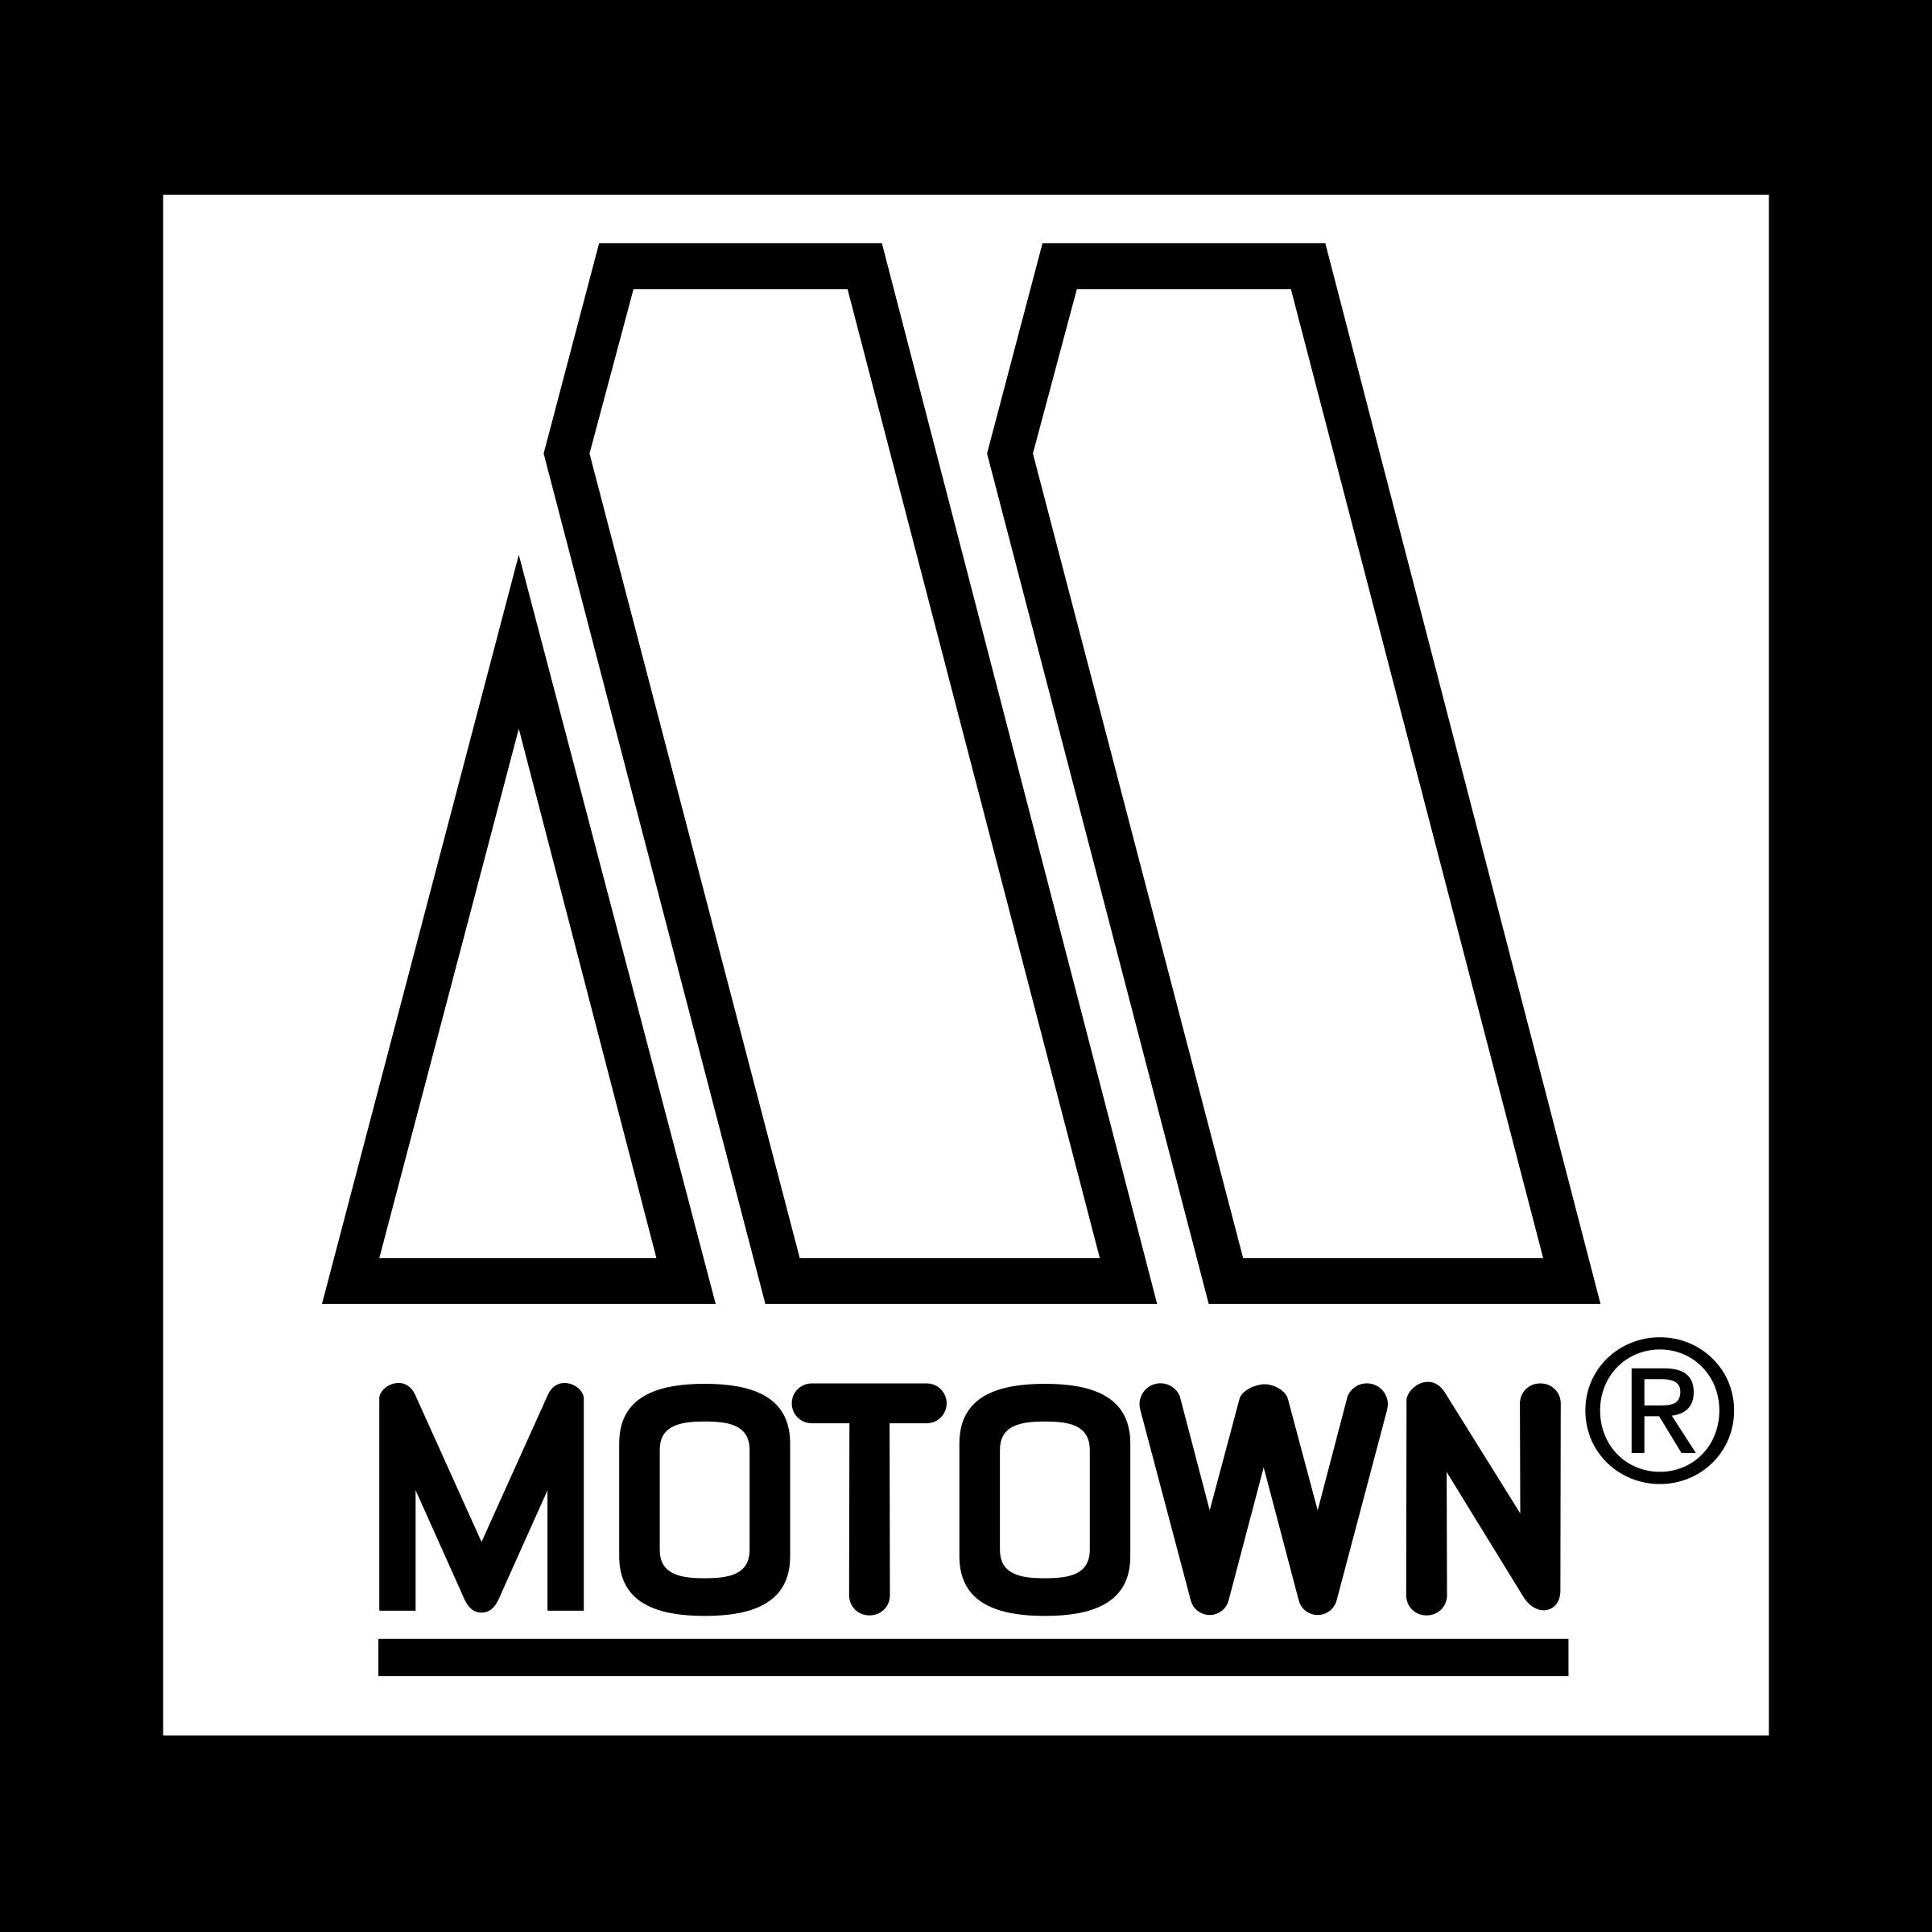 Motown Records Motown Rock Music Music